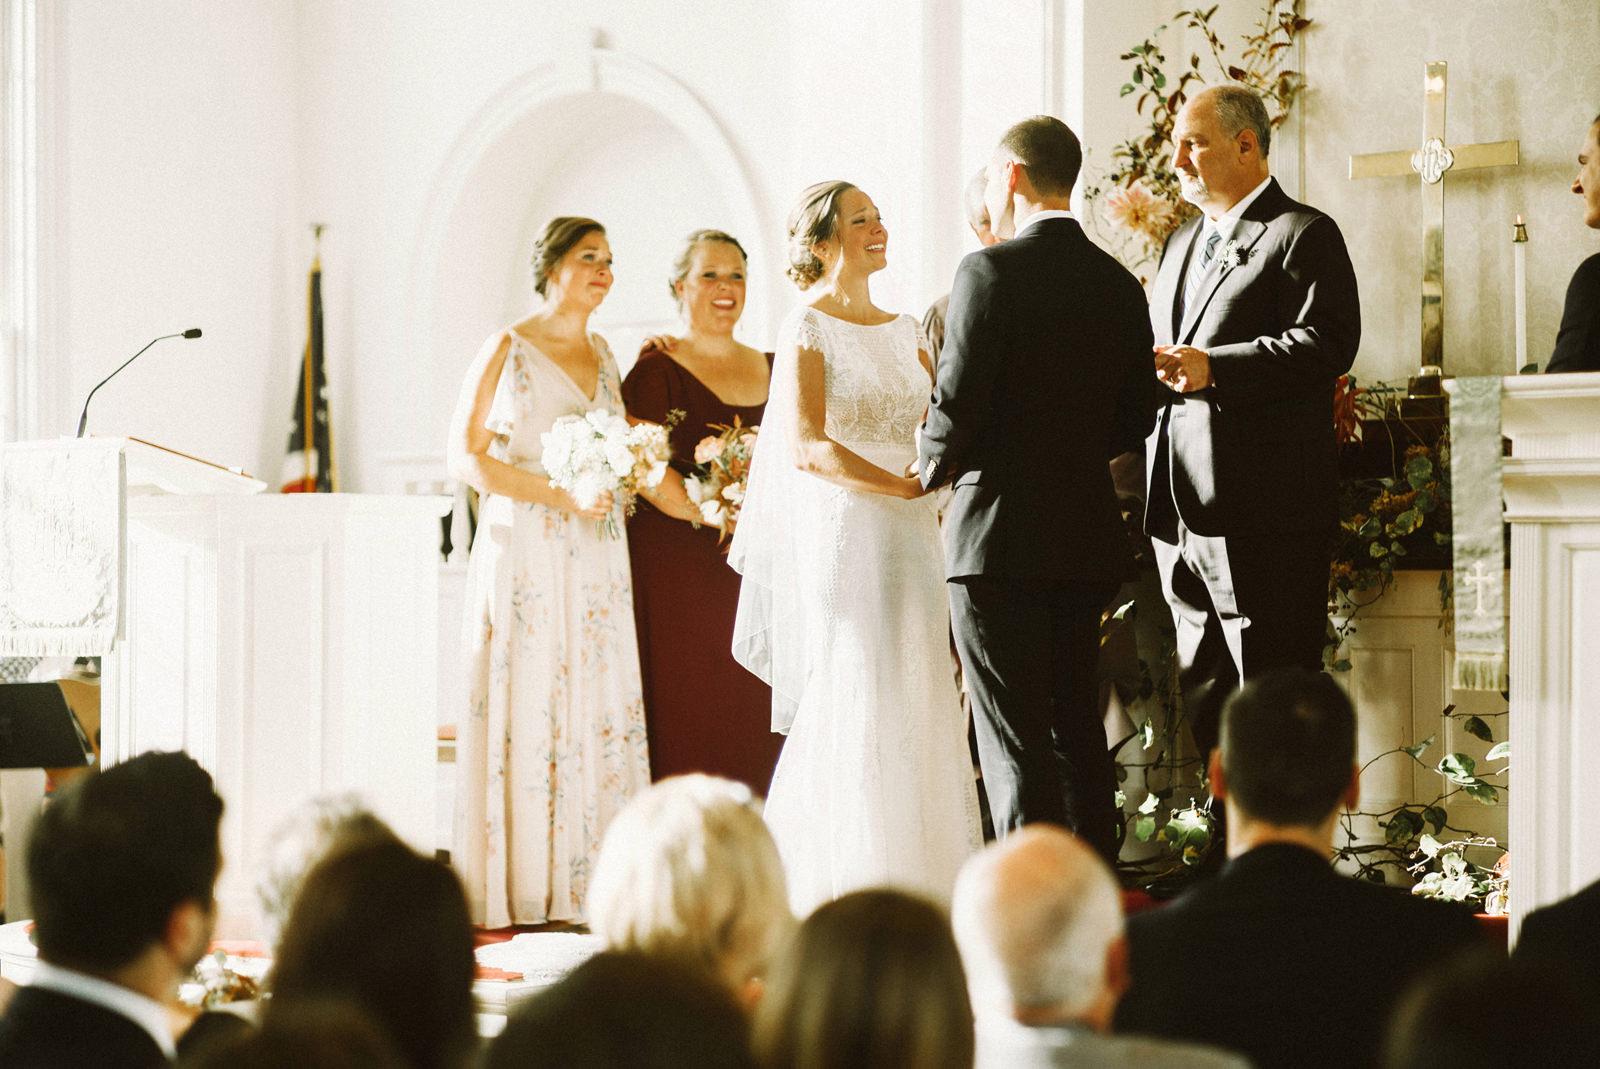 bridgeport-wedding-072 BRIDGEPORT, CONNECTICUT BACKYARD WEDDING